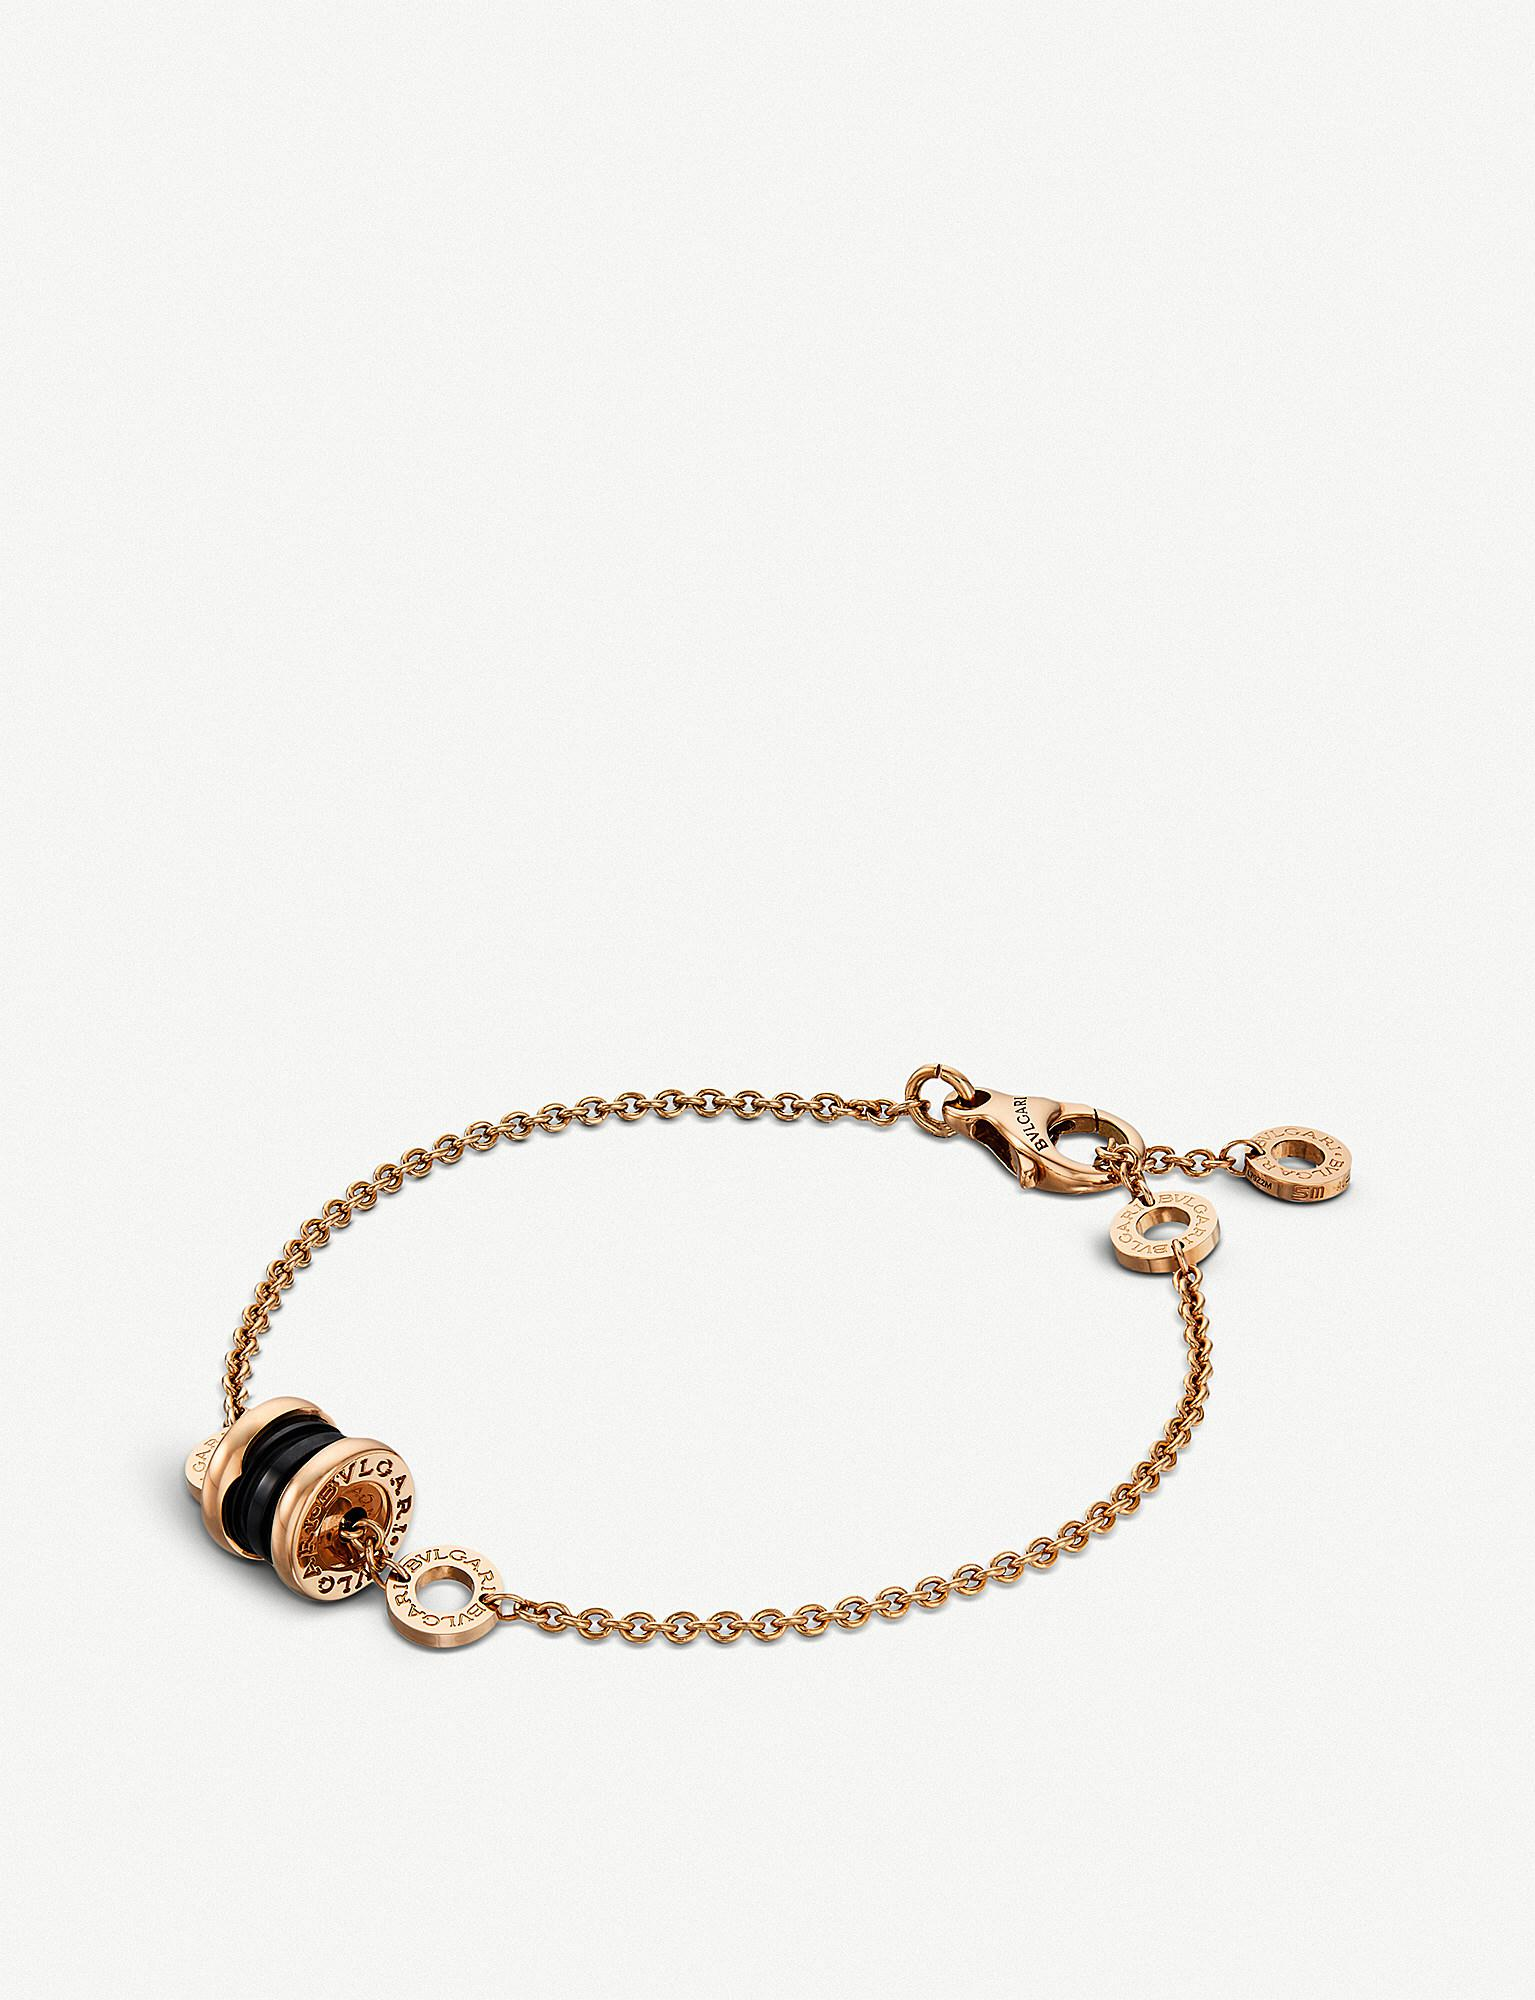 b23191f2a4dee ireland bvlgari b.zero1 ssoft bracelet in rose gold e2744 6eba4